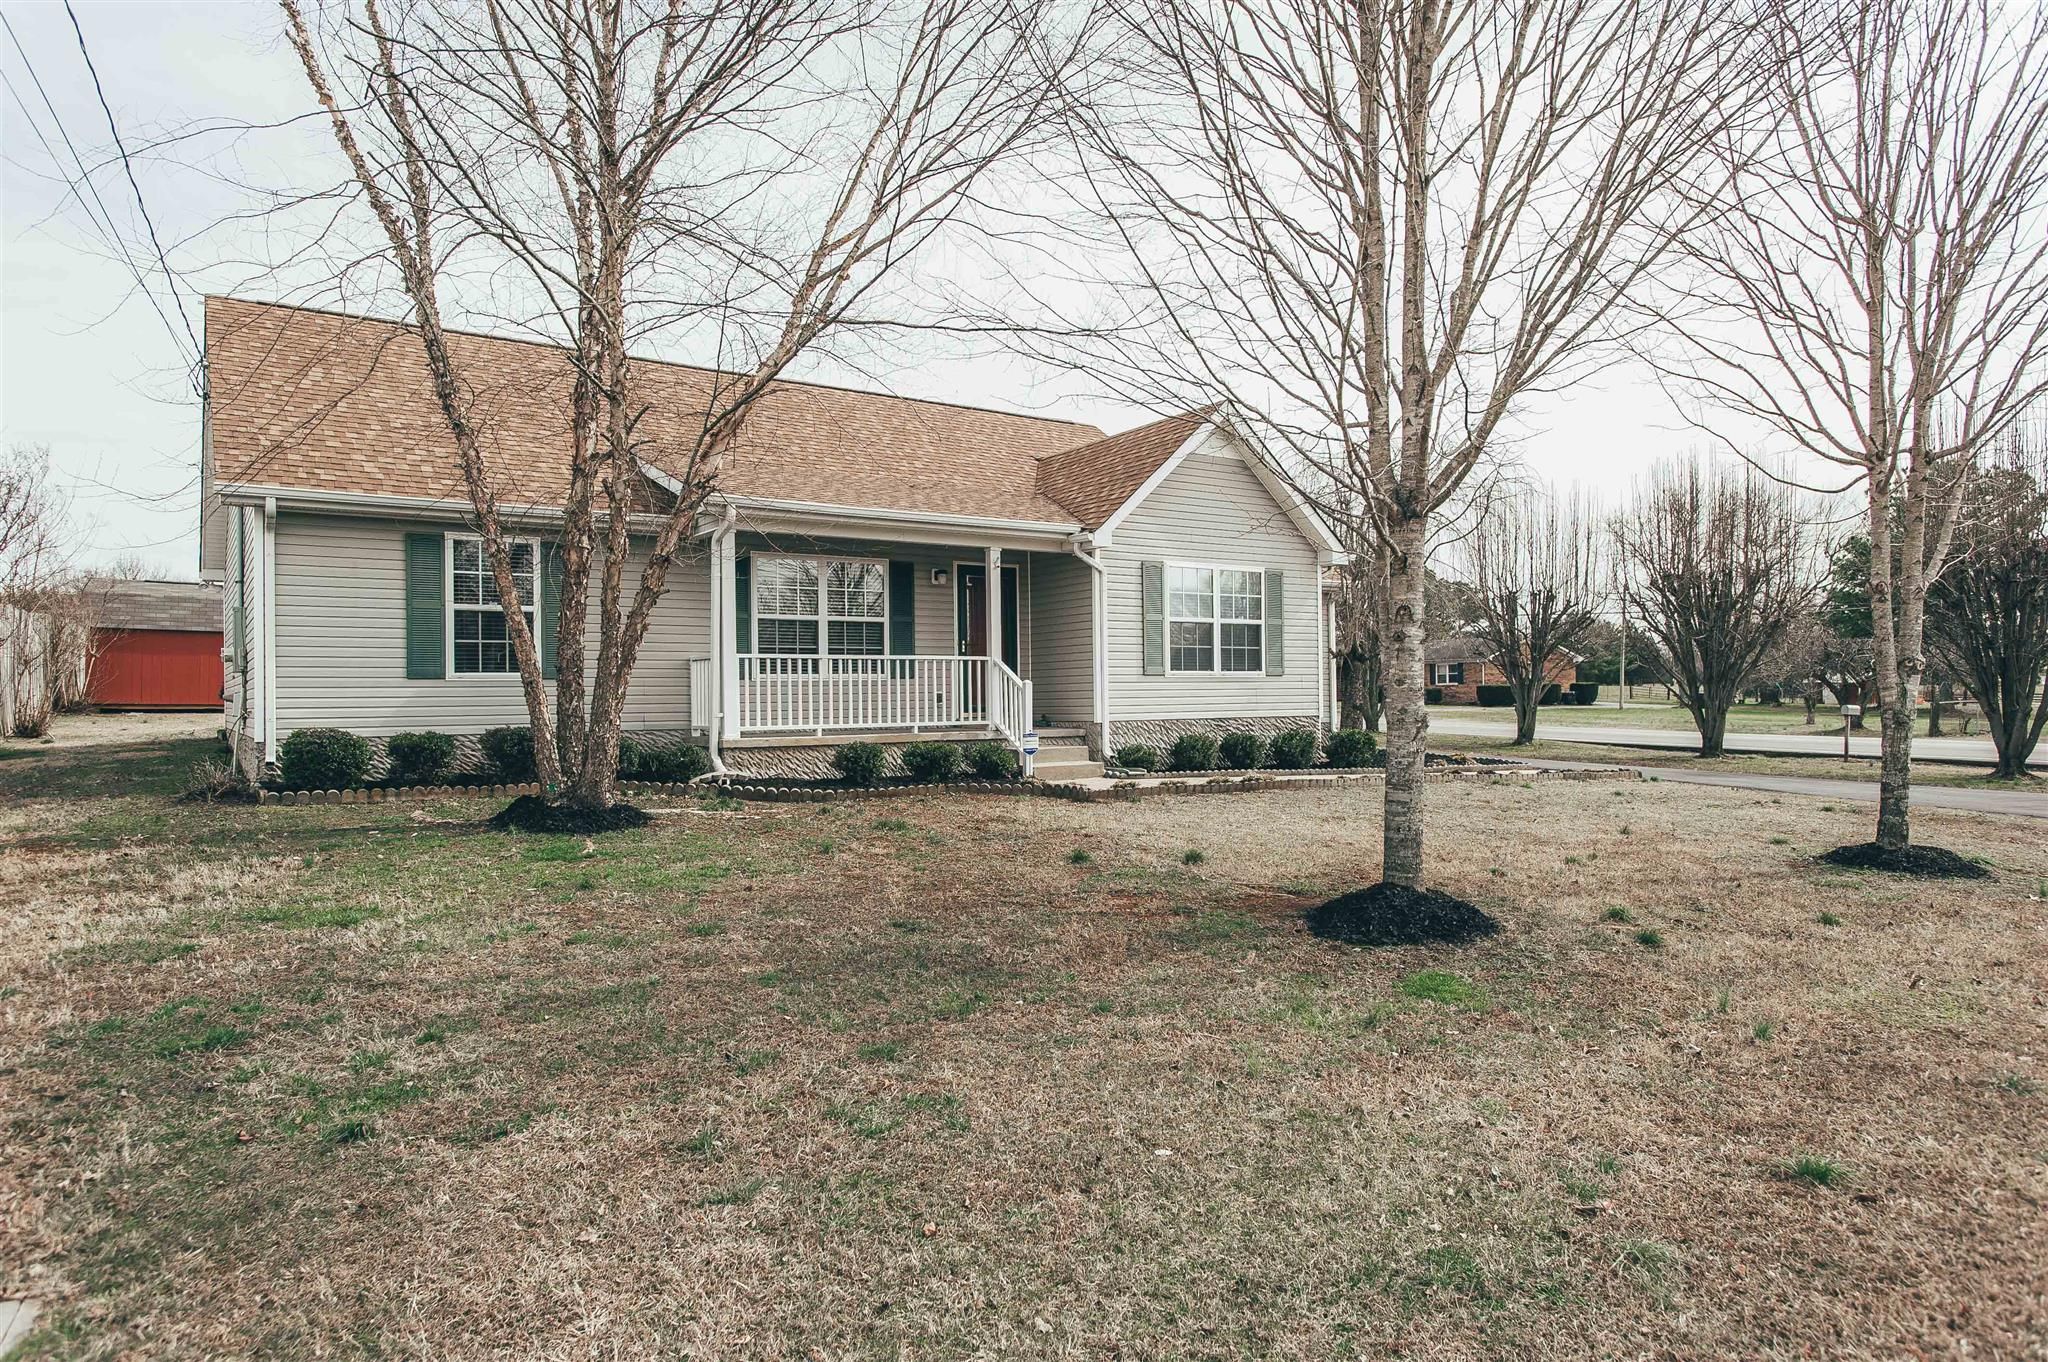 3702 Maple Ln, Murfreesboro, TN 37129